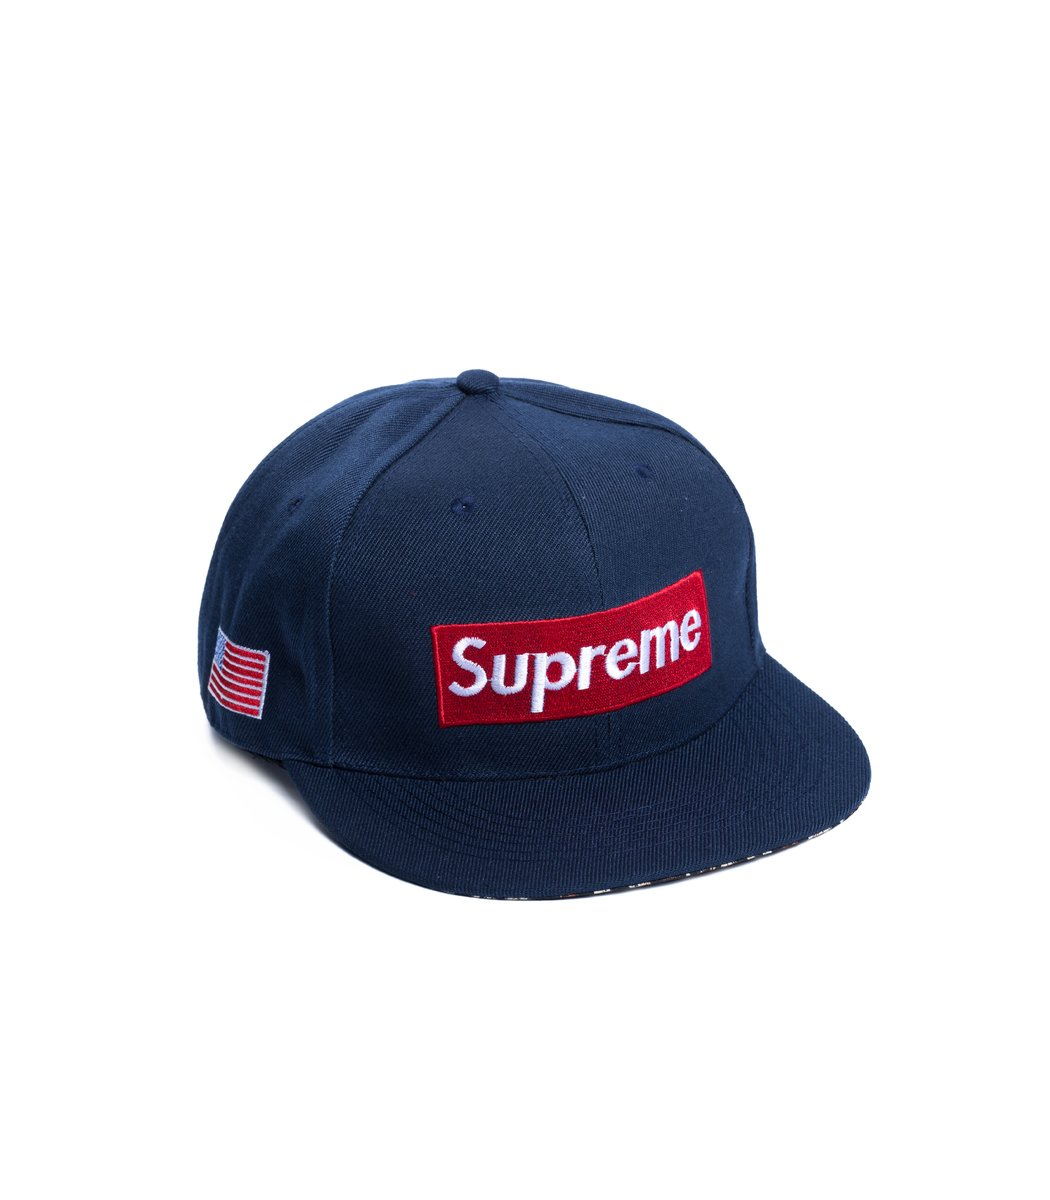 Бейсболка  Supreme USA Синий/красный